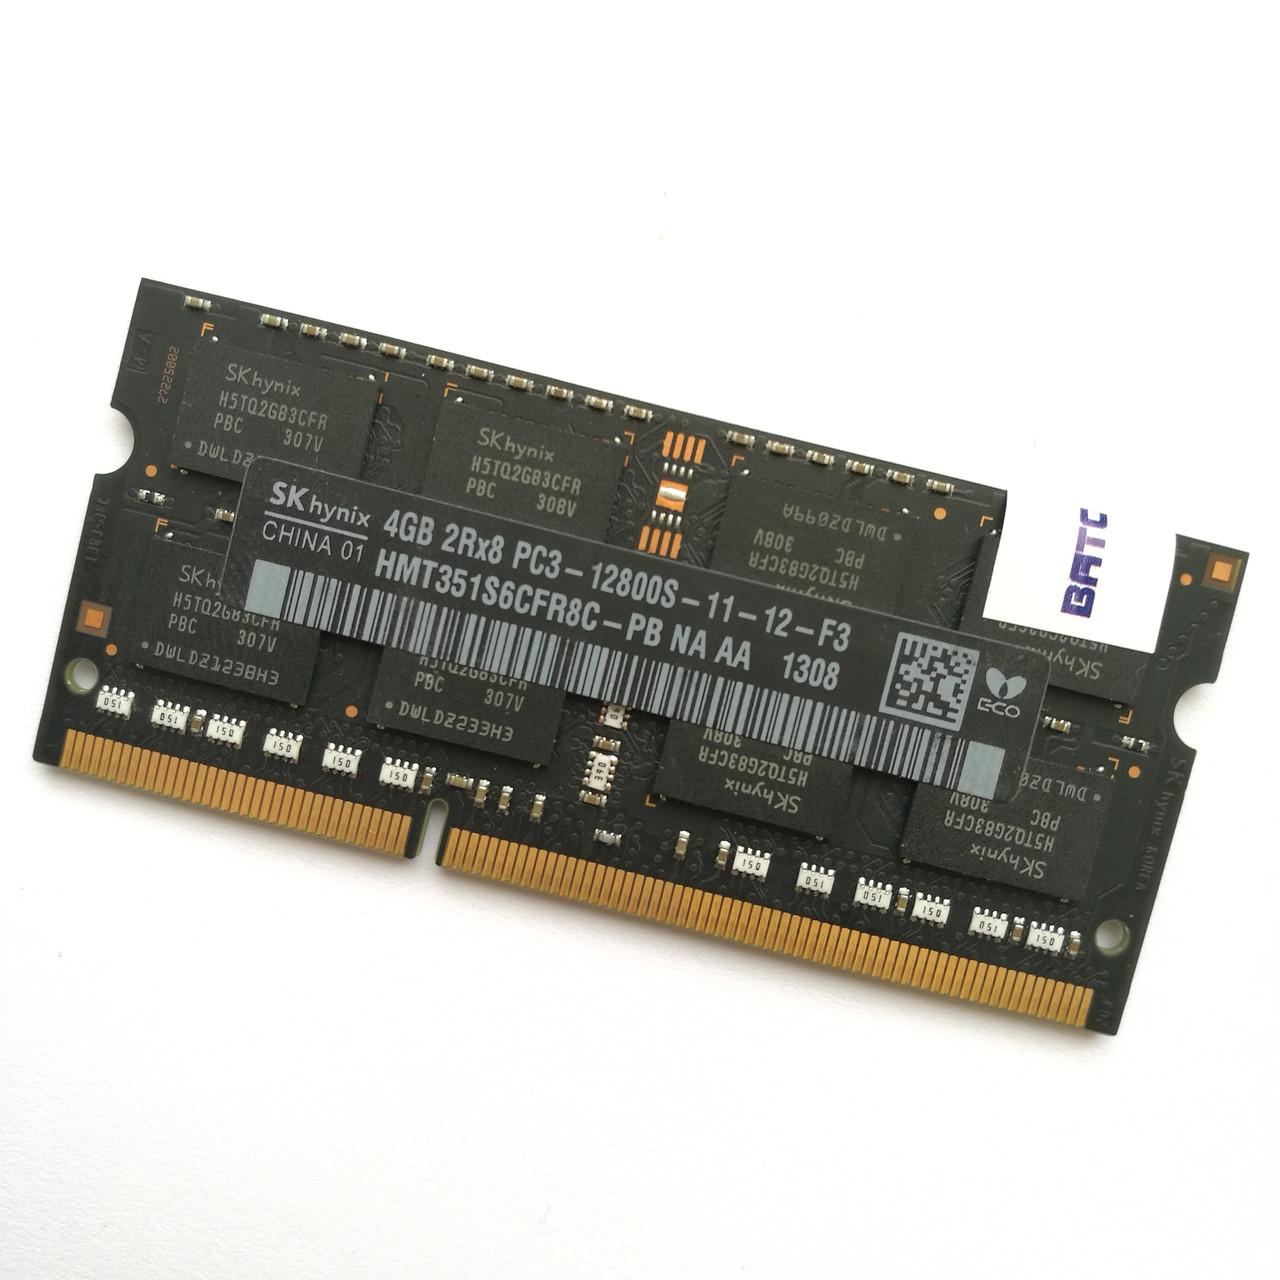 Оперативная память для ноутбука Hynix SODIMM DDR3 4Gb 1600MHz 12800s CL11 (HMT351S6CFR8C-PB NA AA) Б/У